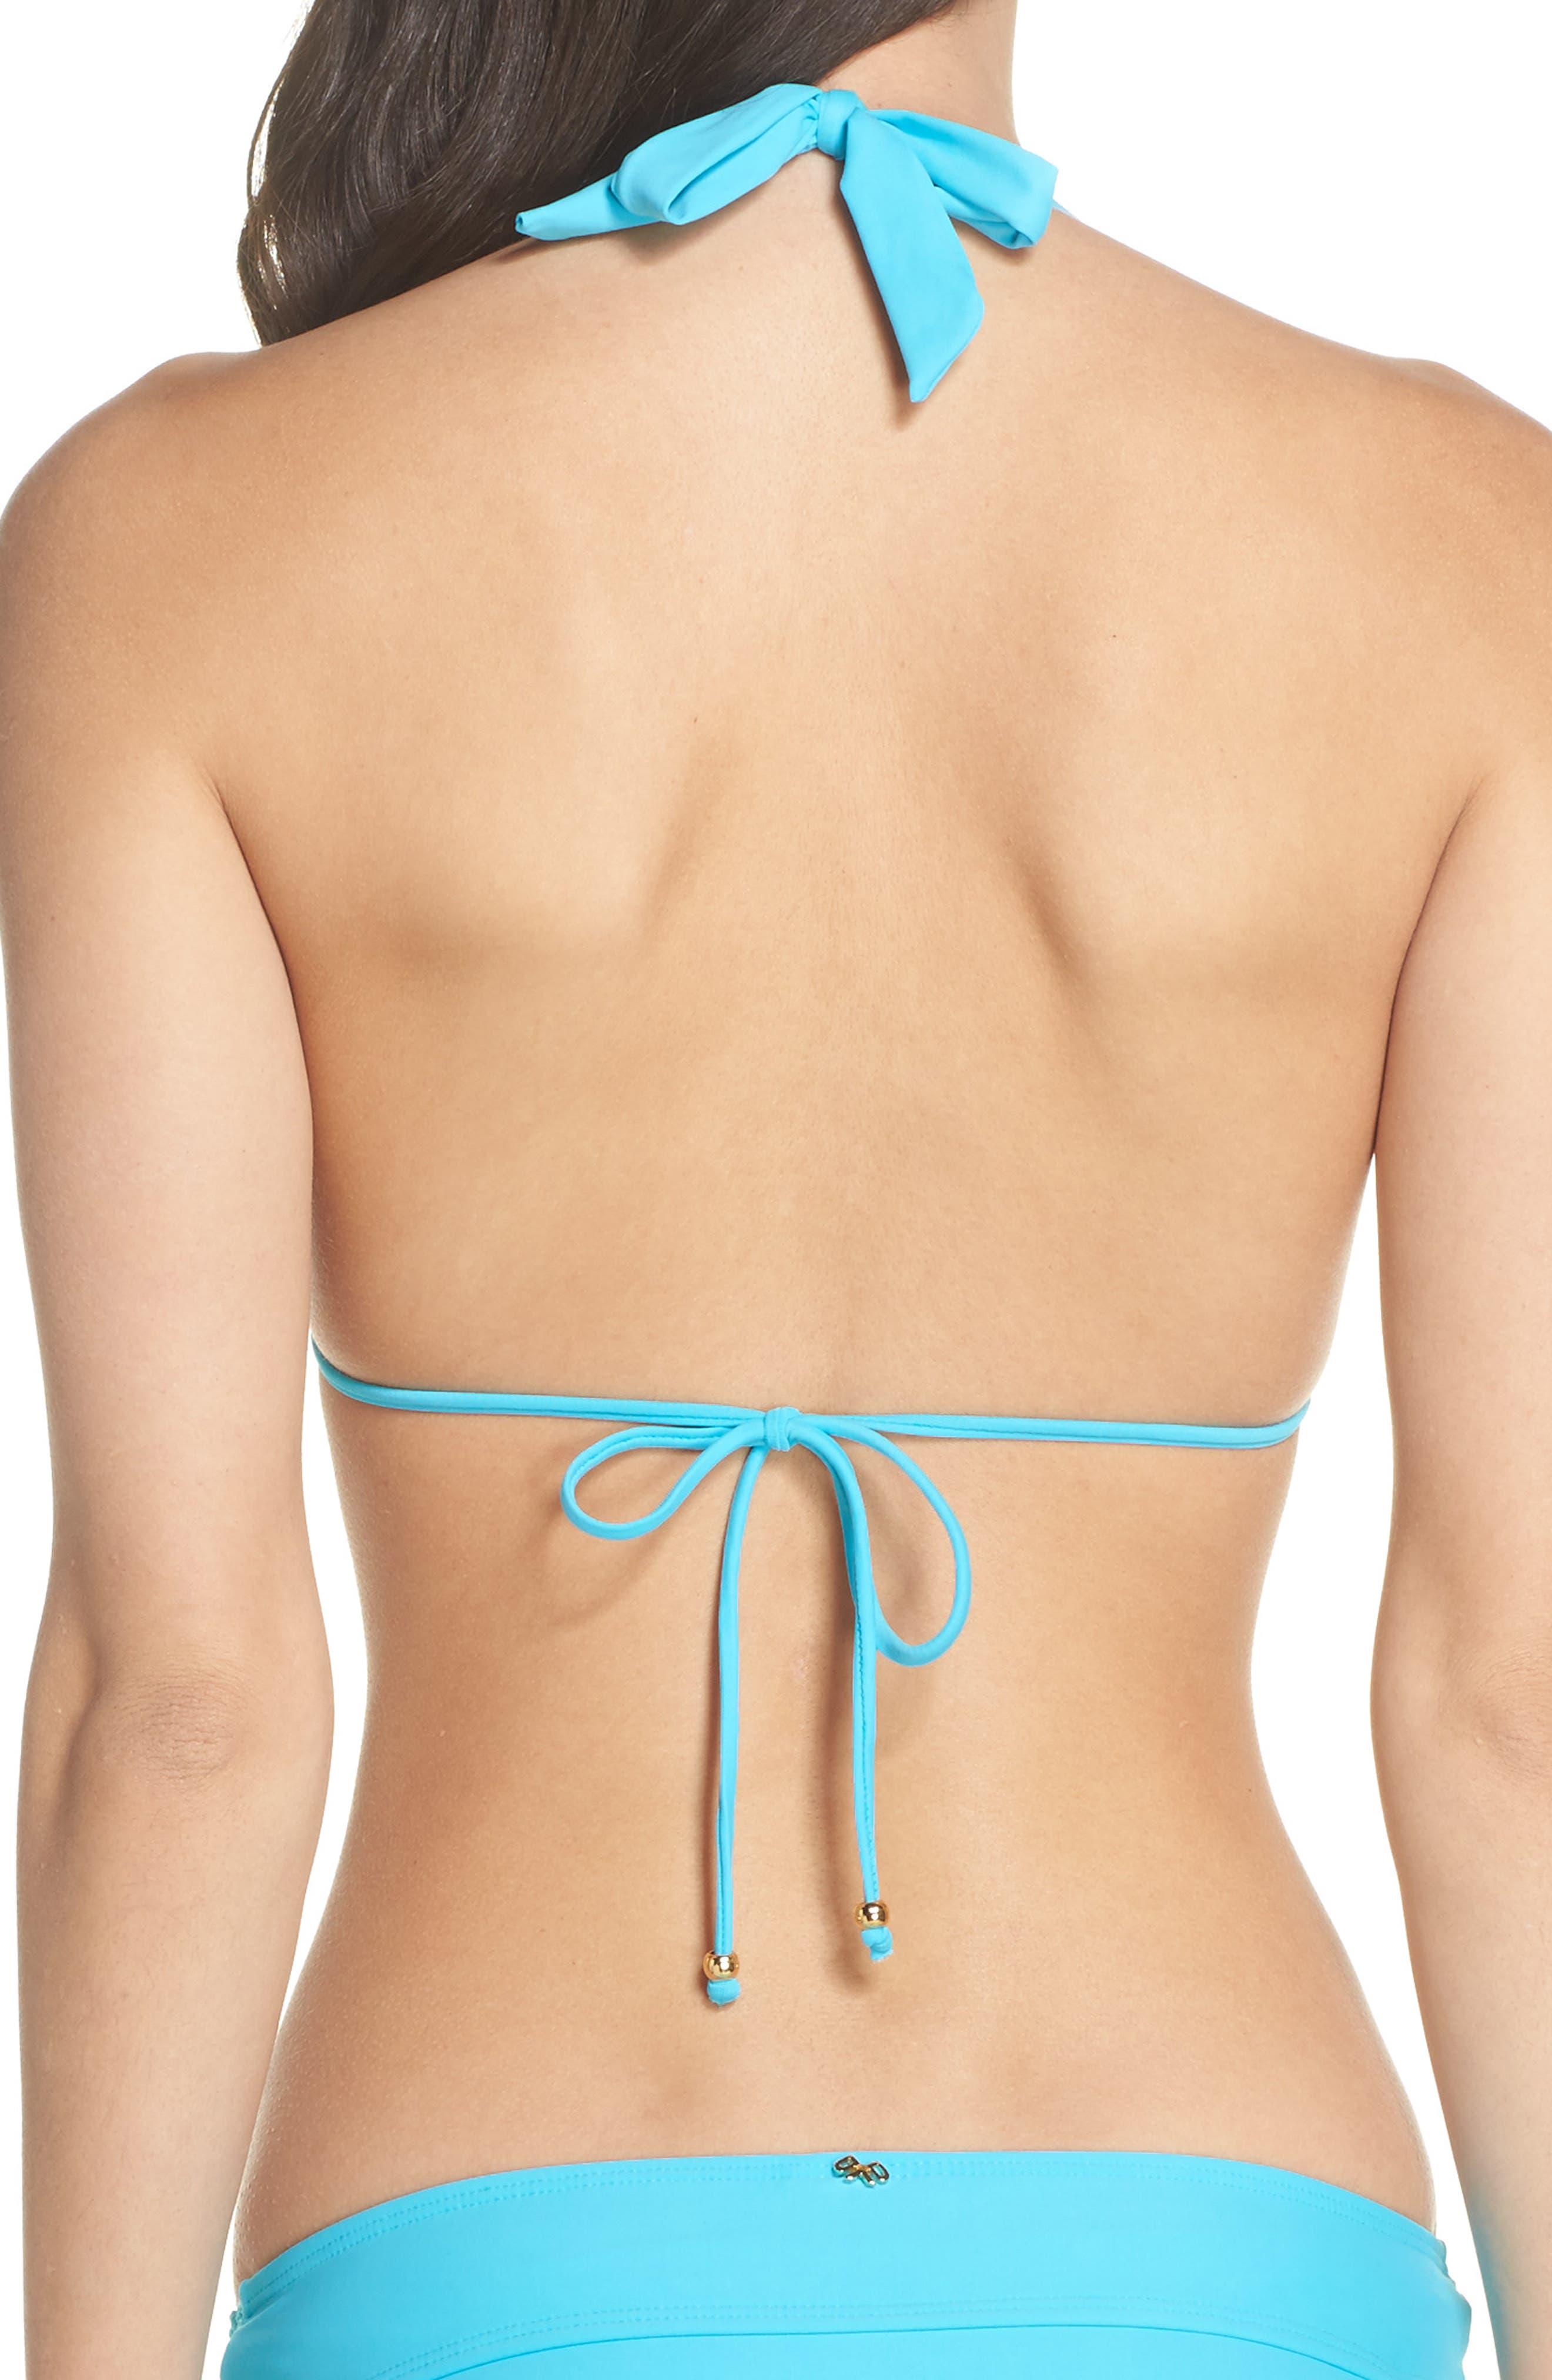 Lace Halter Bikini Top,                             Alternate thumbnail 2, color,                             Marine